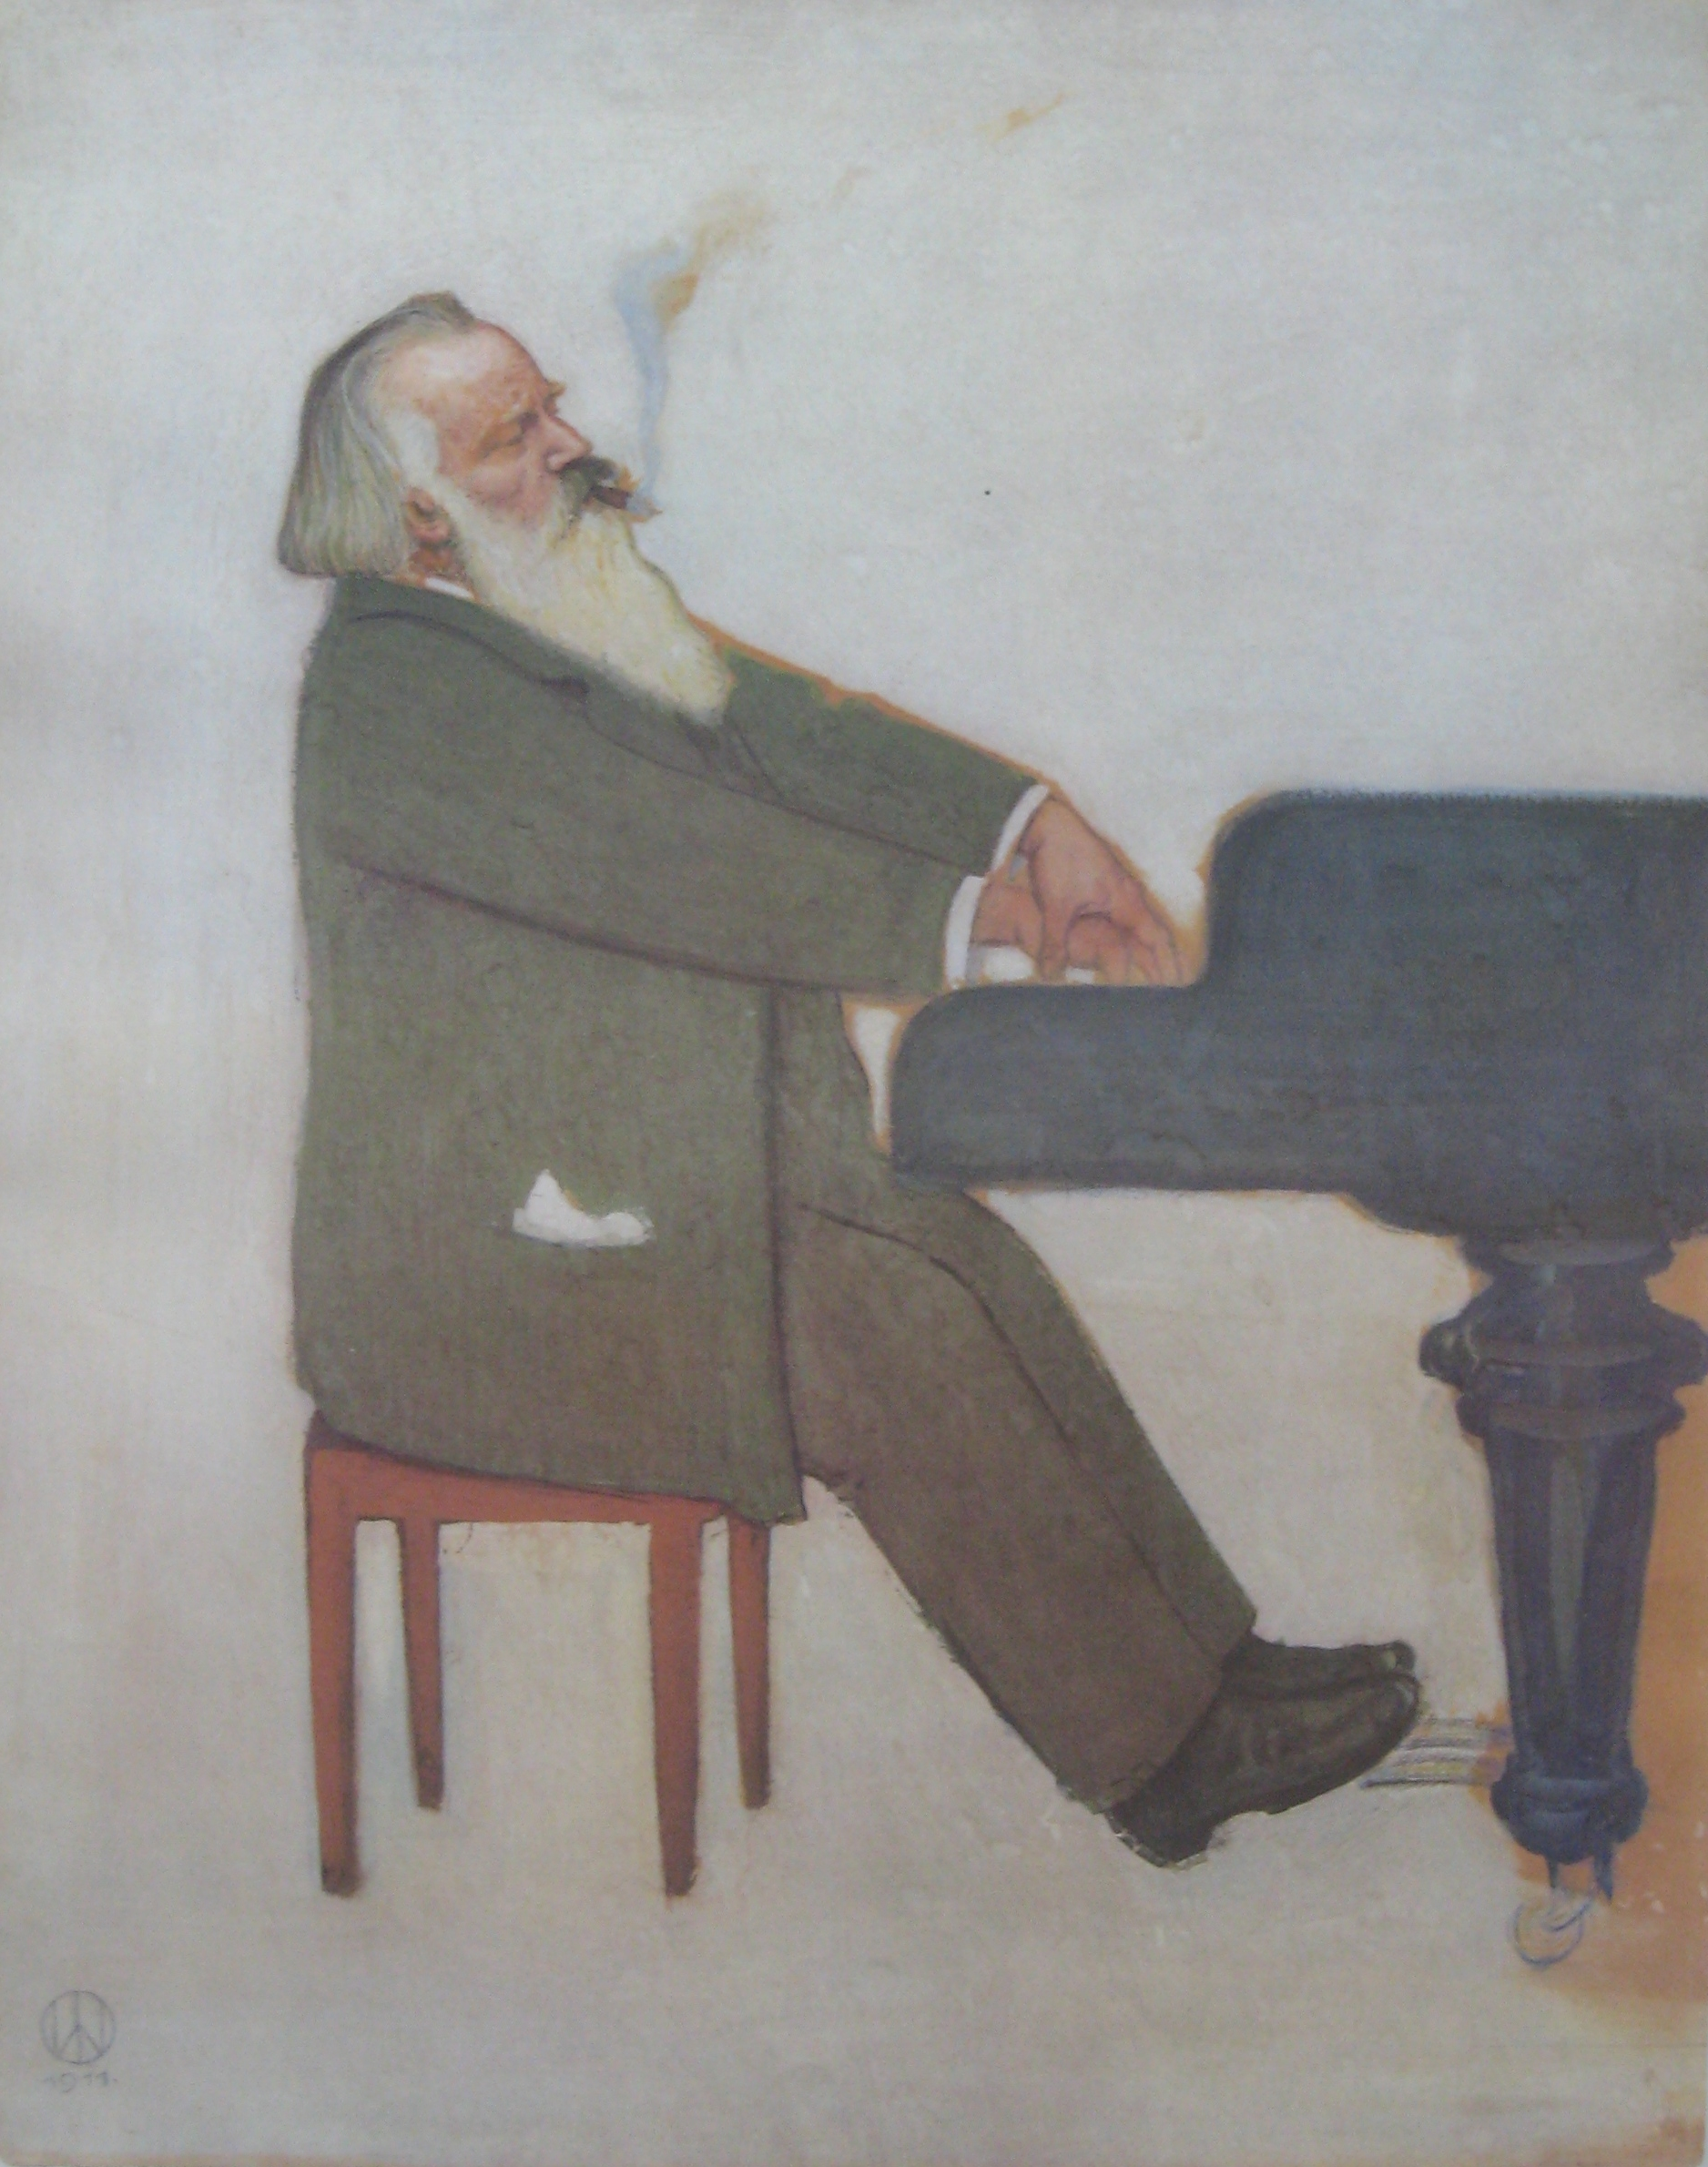 Johannes Brahms Brahms - Philharmonia Orchestra - Symphony No. 3 In F Major